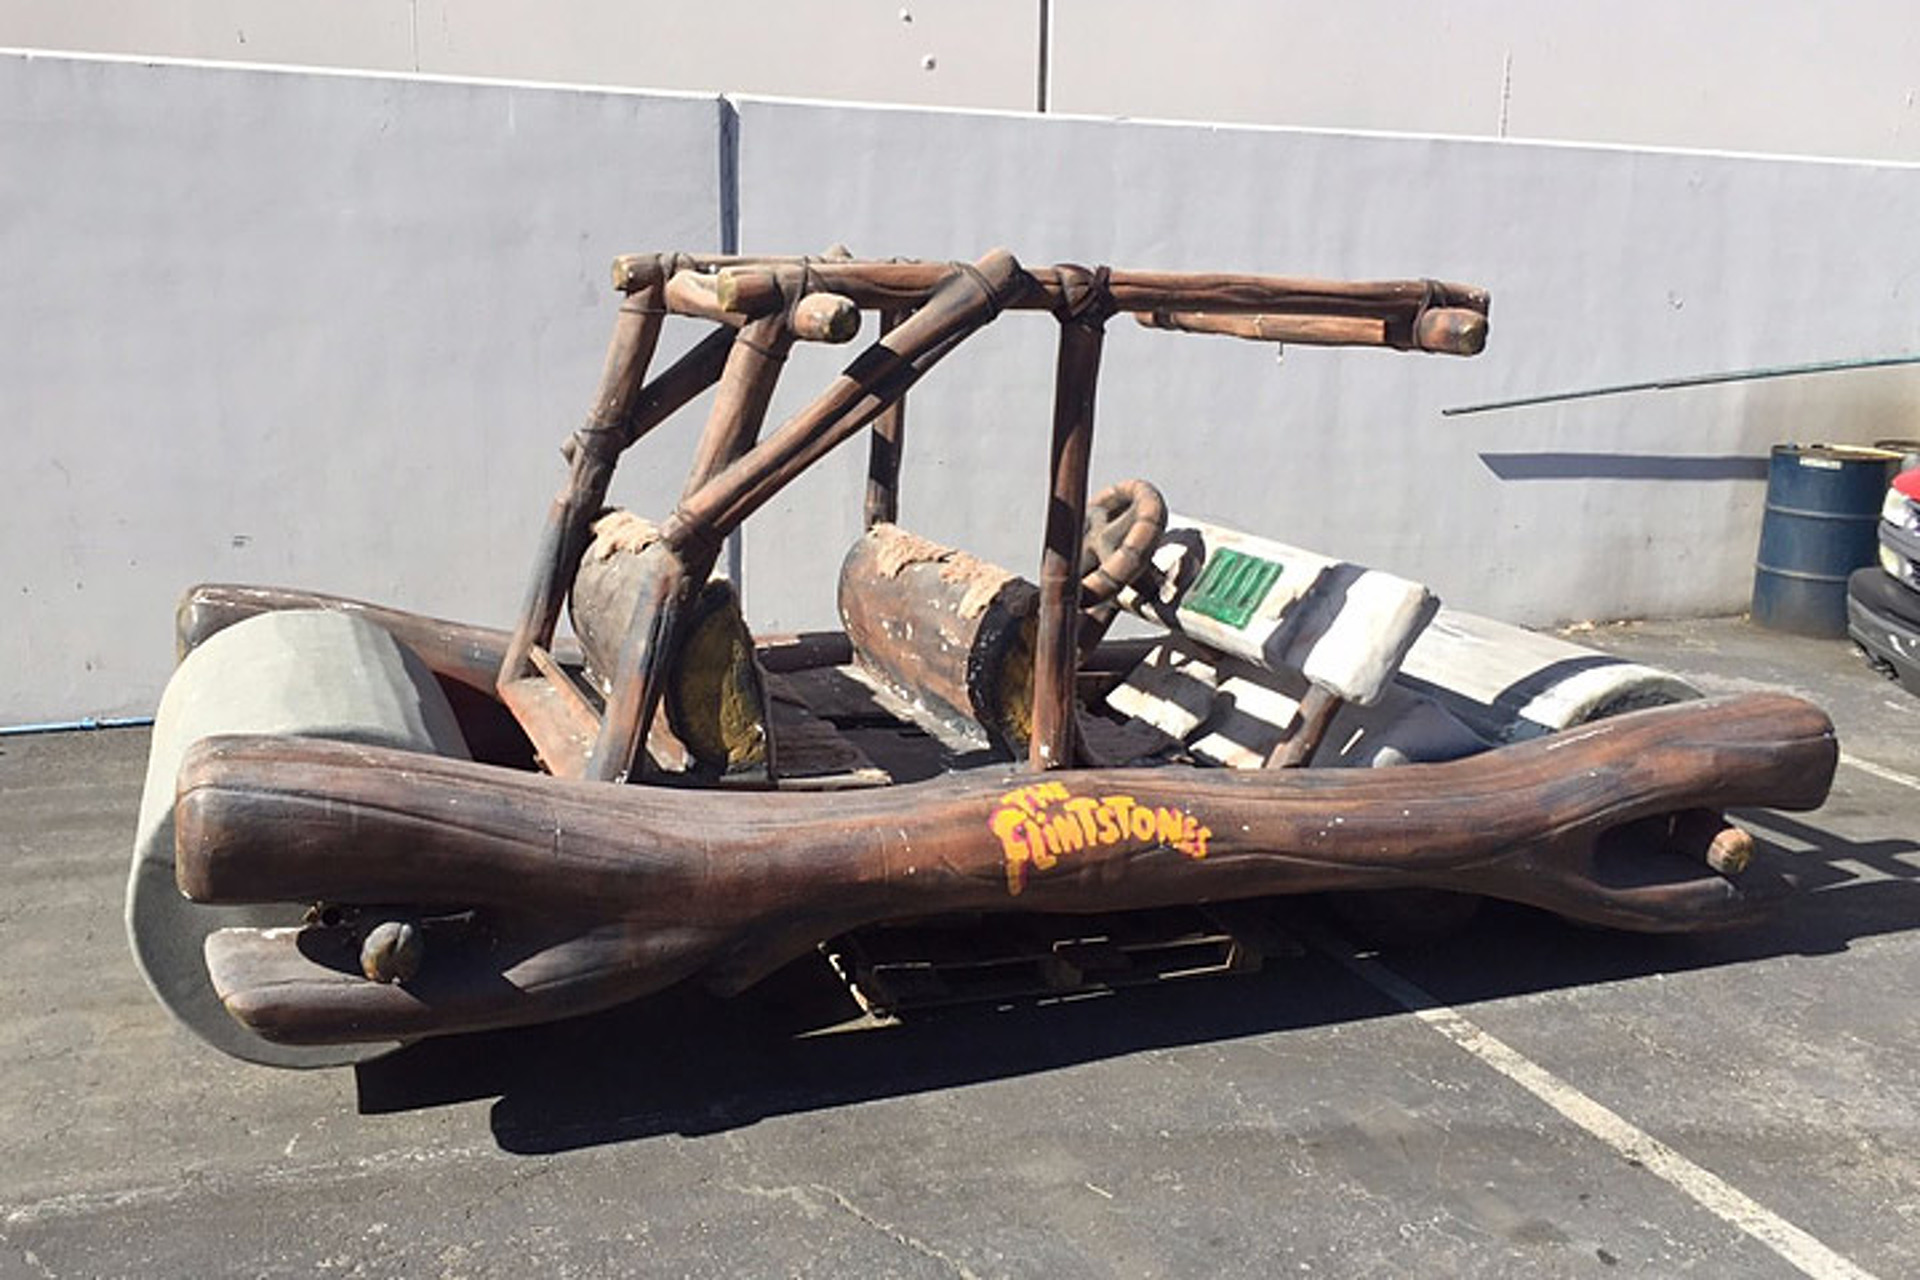 Yabba Dabba Doo! A Flintstones Flintmobile is Up for Sale